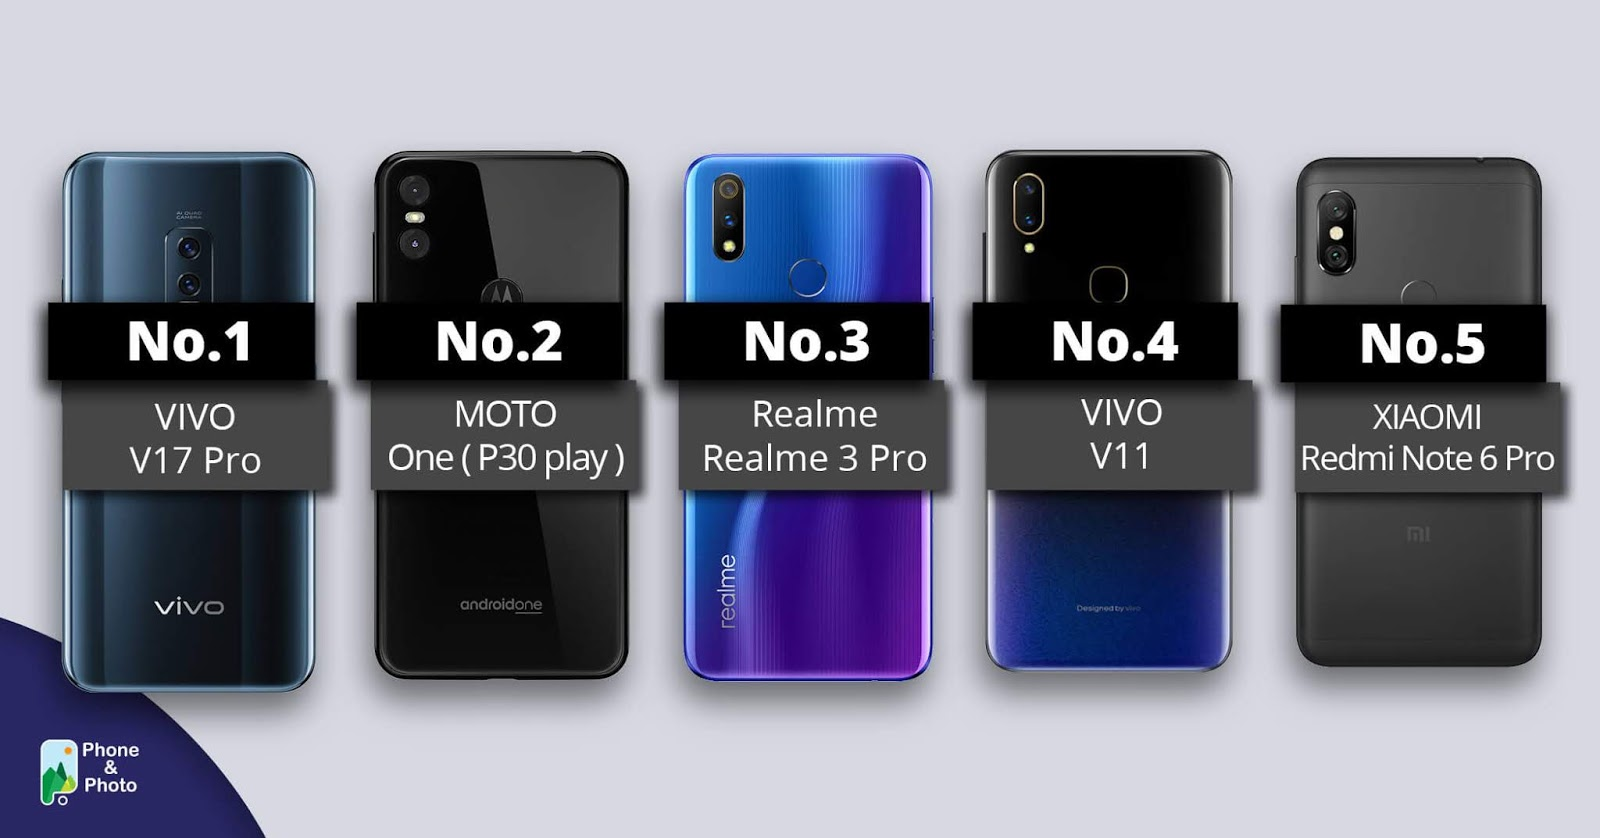 Top 10 Best Camera Phone 2020 Under $500 USD_Top 6~Top 10